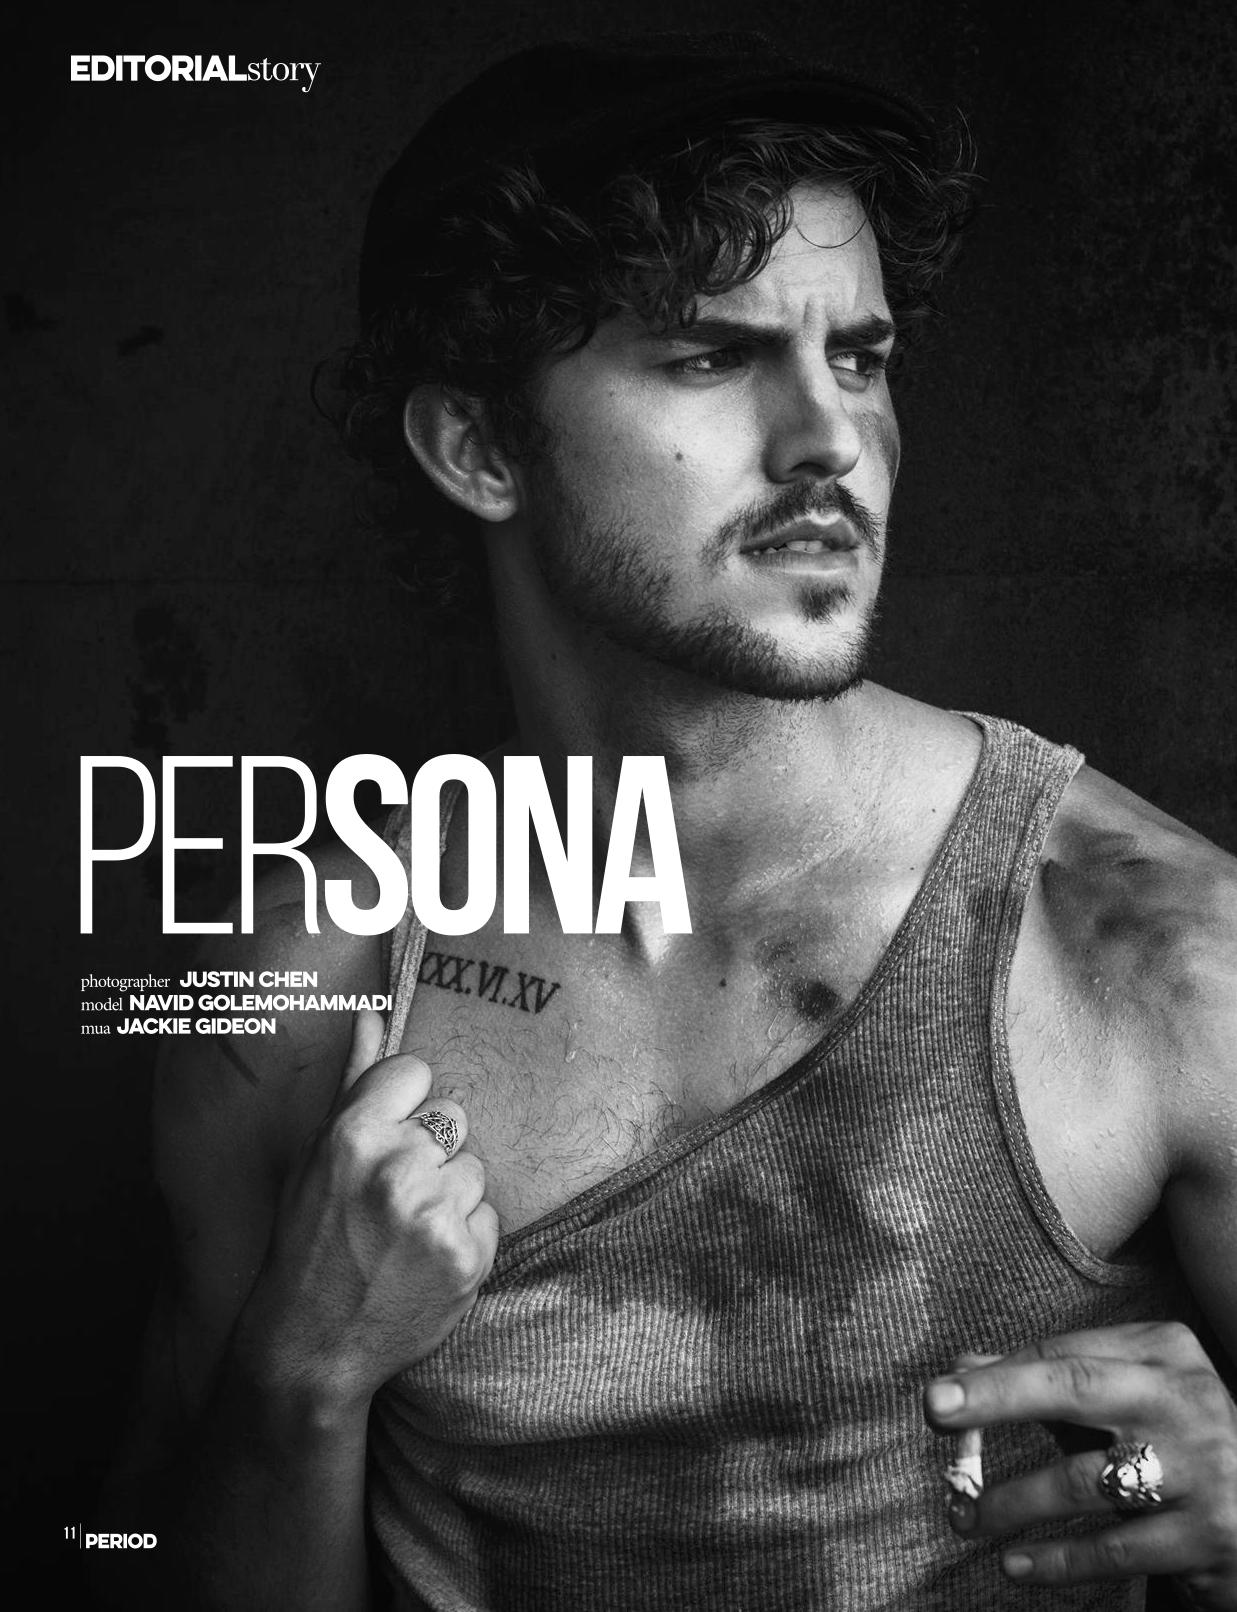 Period_2017_PERIOD_Ft_Charlie_Matthews_Cover_A.jpg